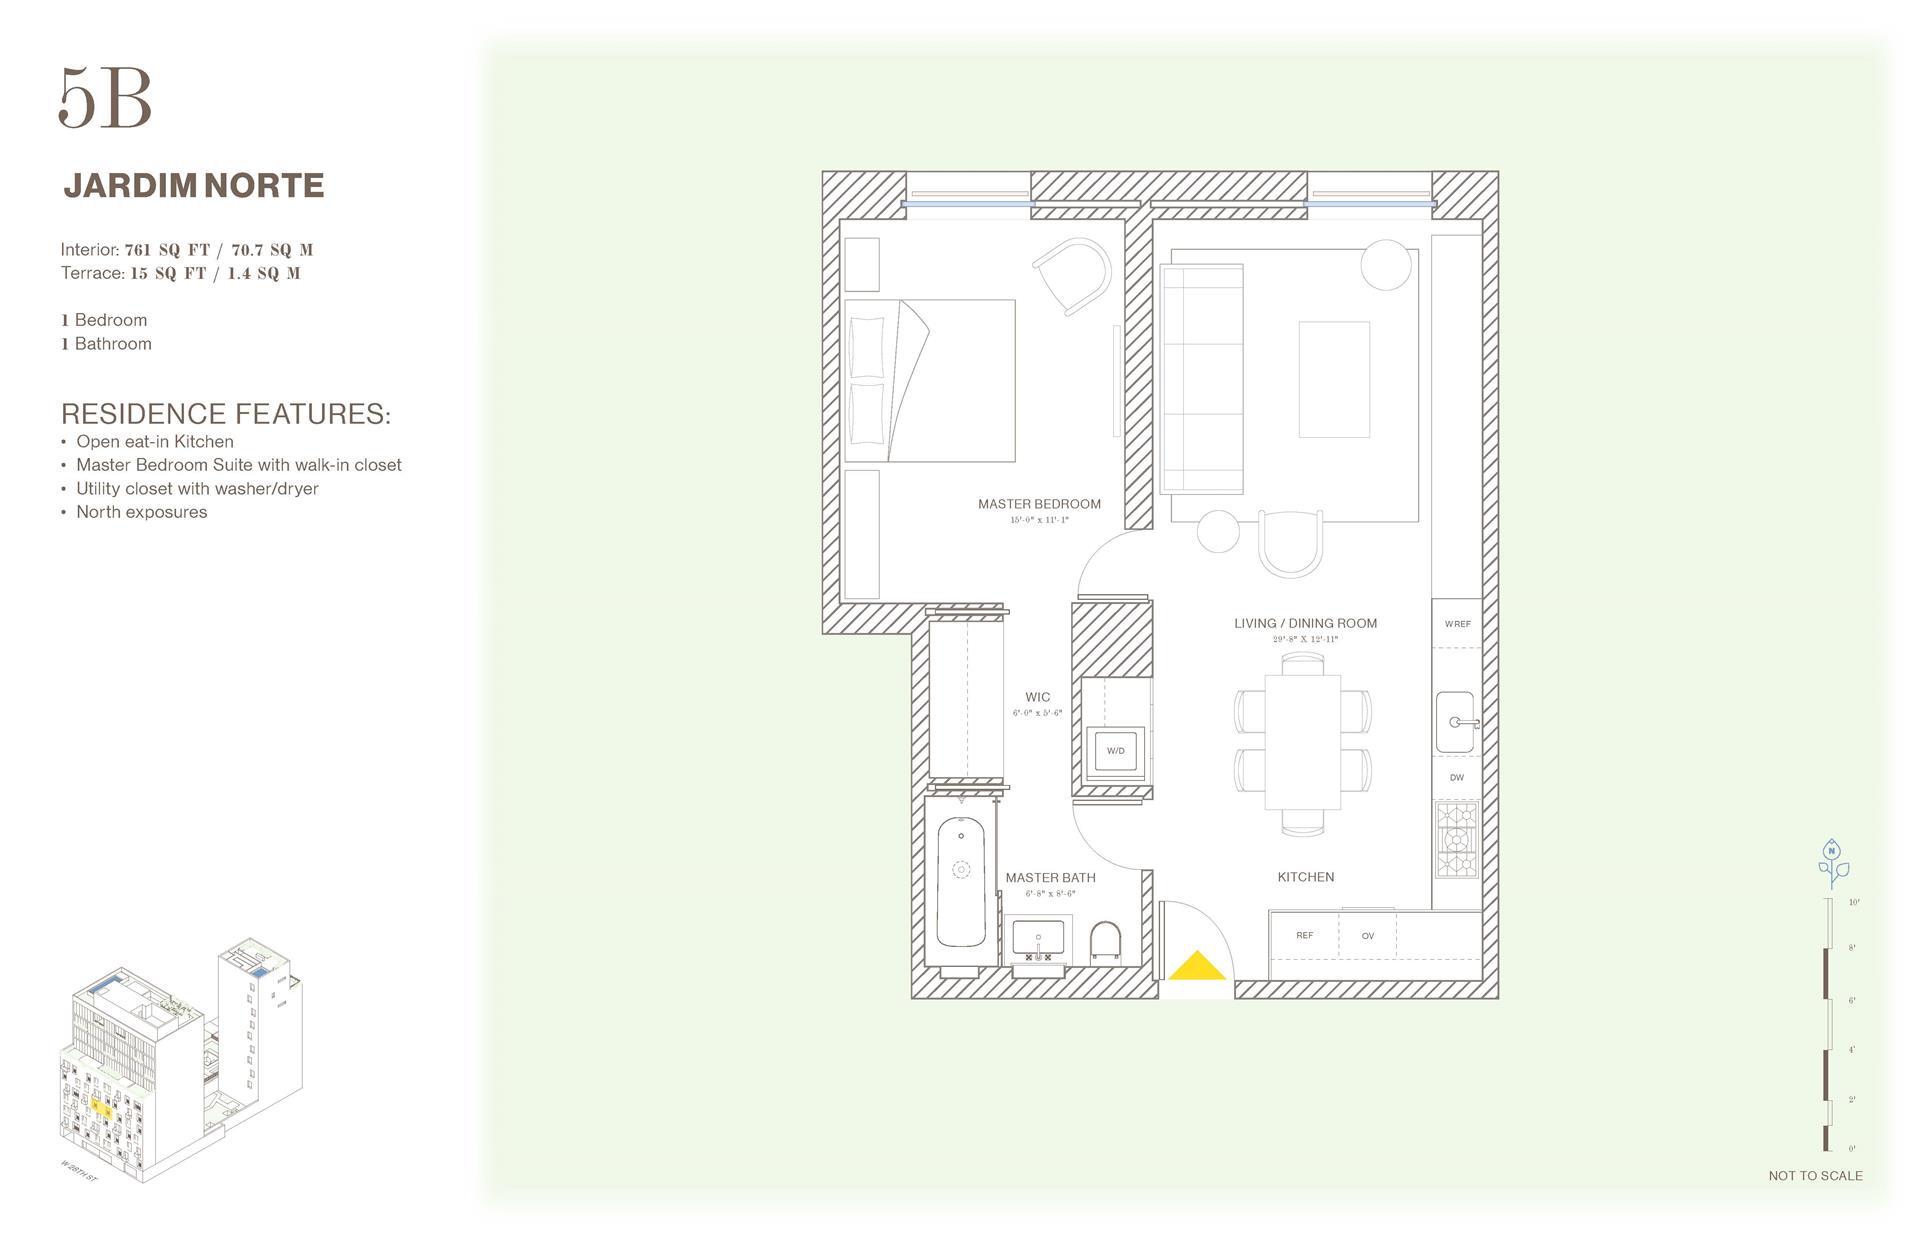 Floor plan of Jardim, 527 West 27th Street, 5B - Chelsea, New York